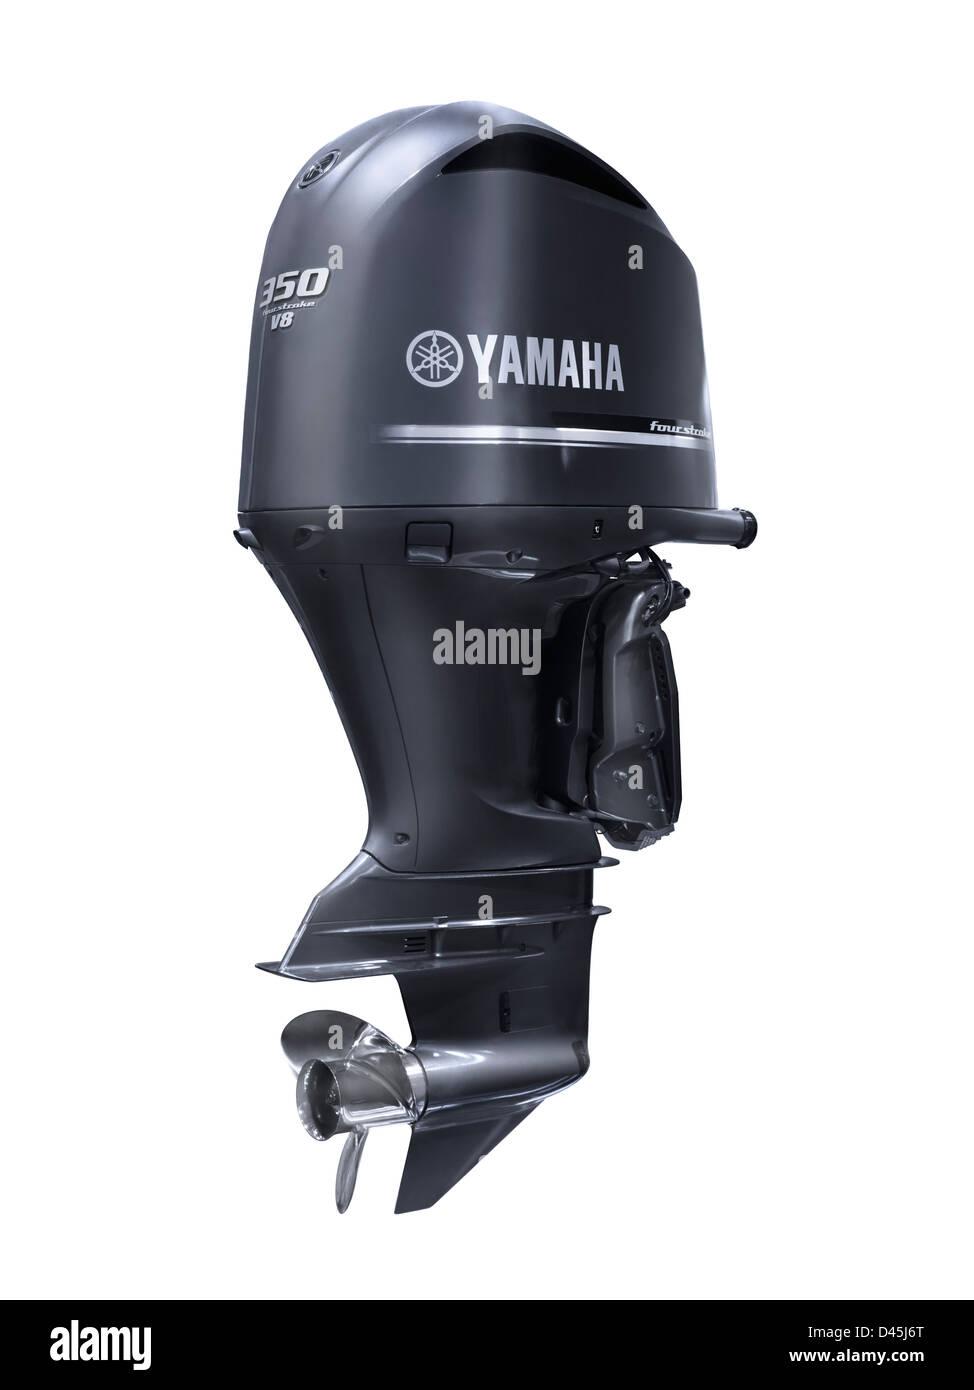 Yamaha Outboard Motor Stock Photos & Yamaha Outboard Motor